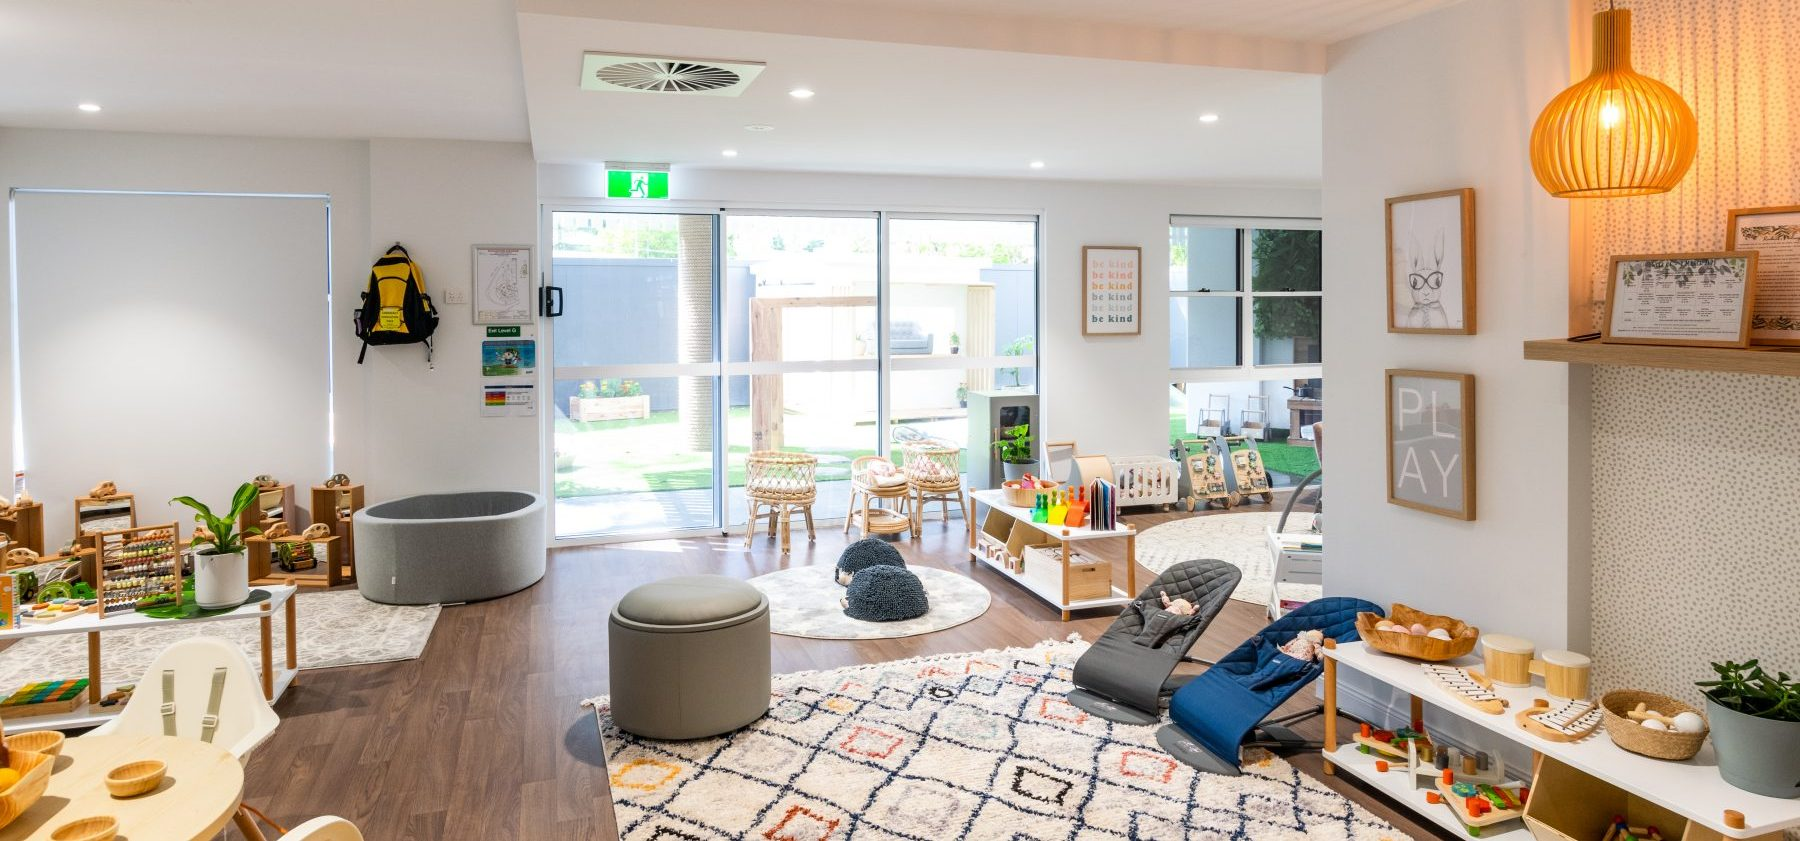 Eden Academy Bardon Interior Playroom